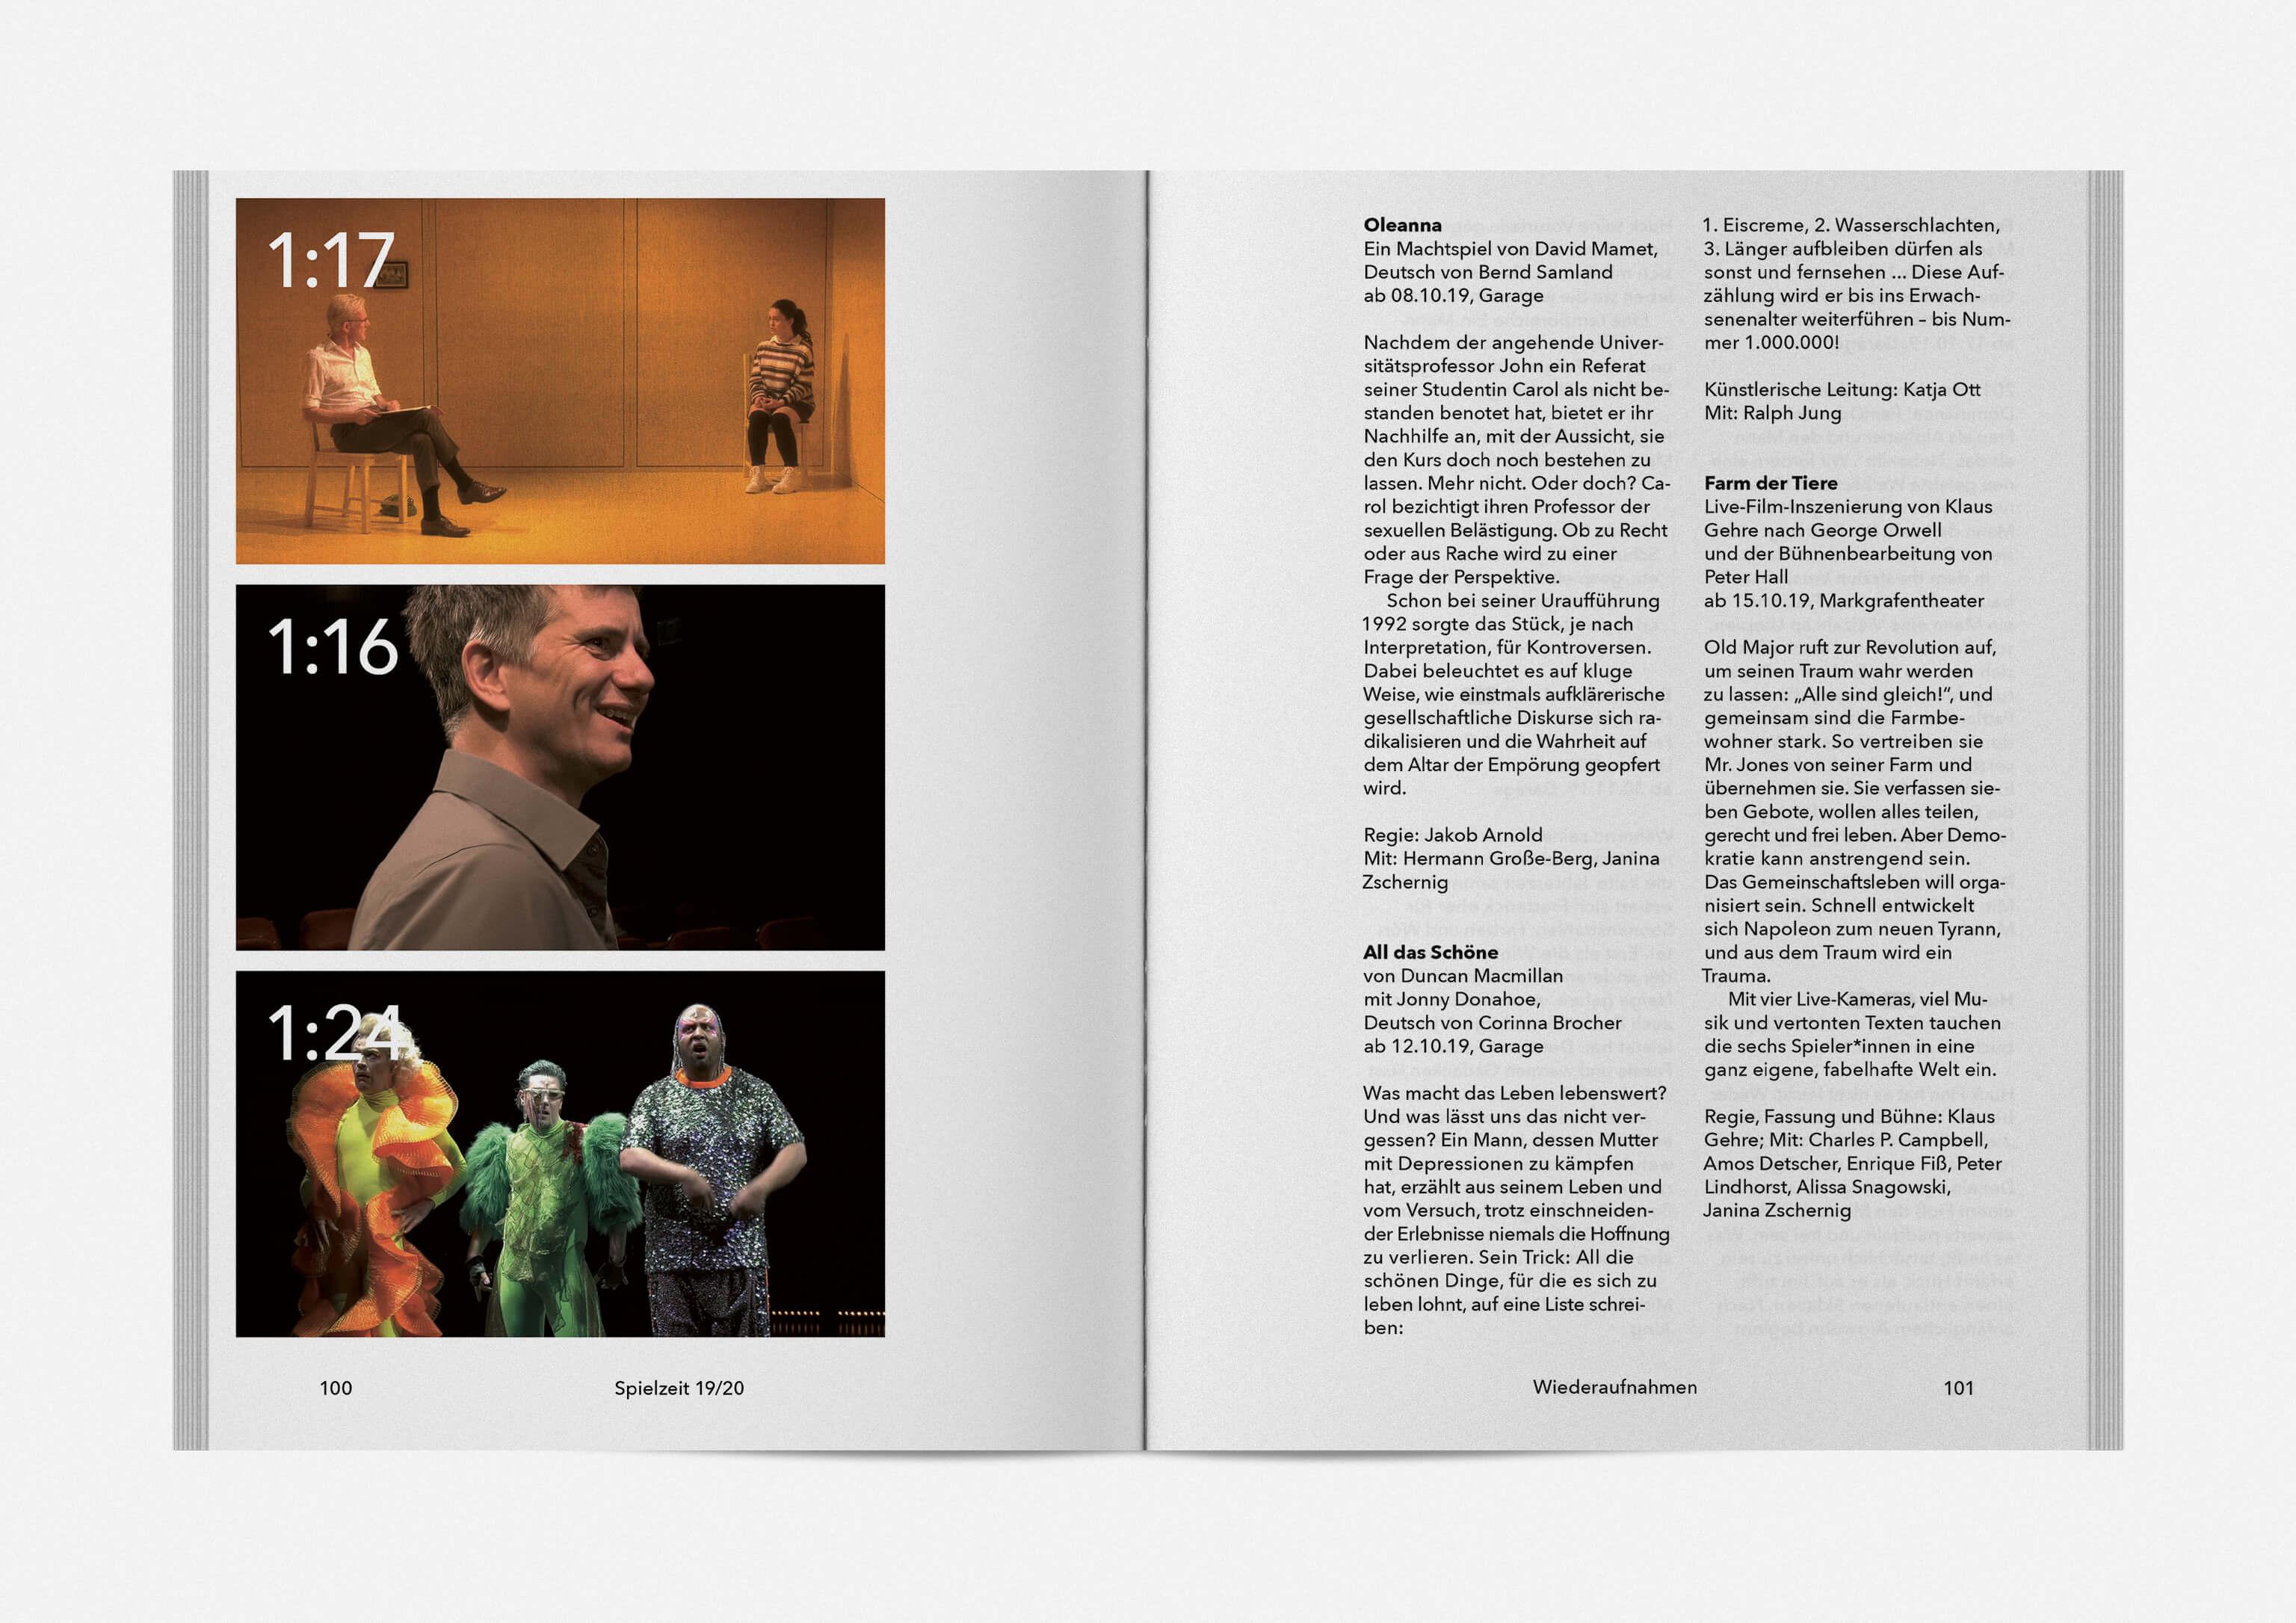 https://neuegestaltung.de/media/pages/clients/theater-erlangen-season-program-19-20/fdfd1078c2-1597415336/te_szh_19_20_innenseite_100_101_ng.jpg